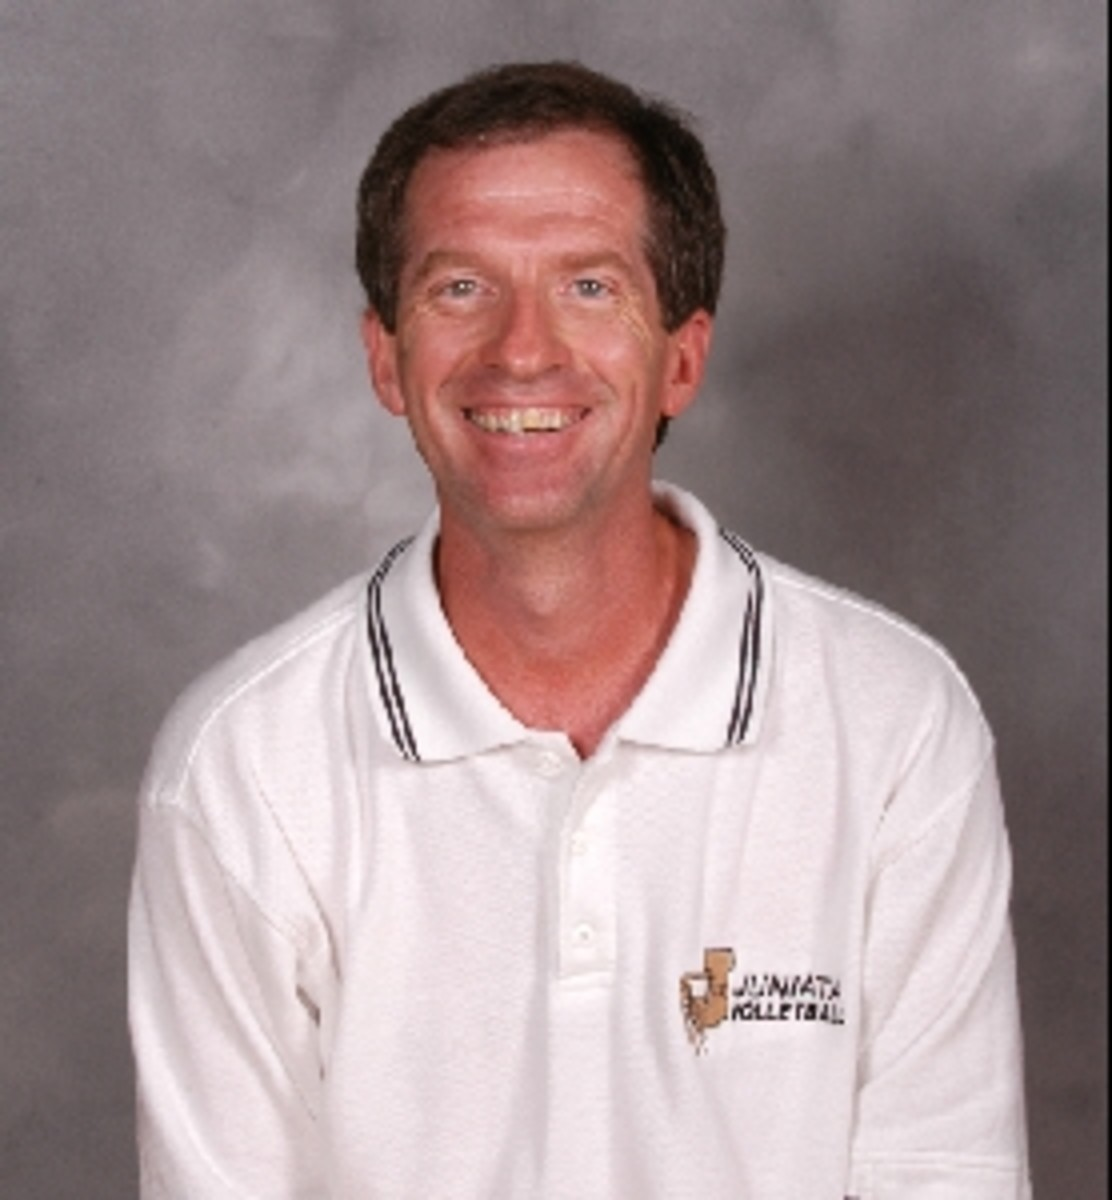 Larry Bock